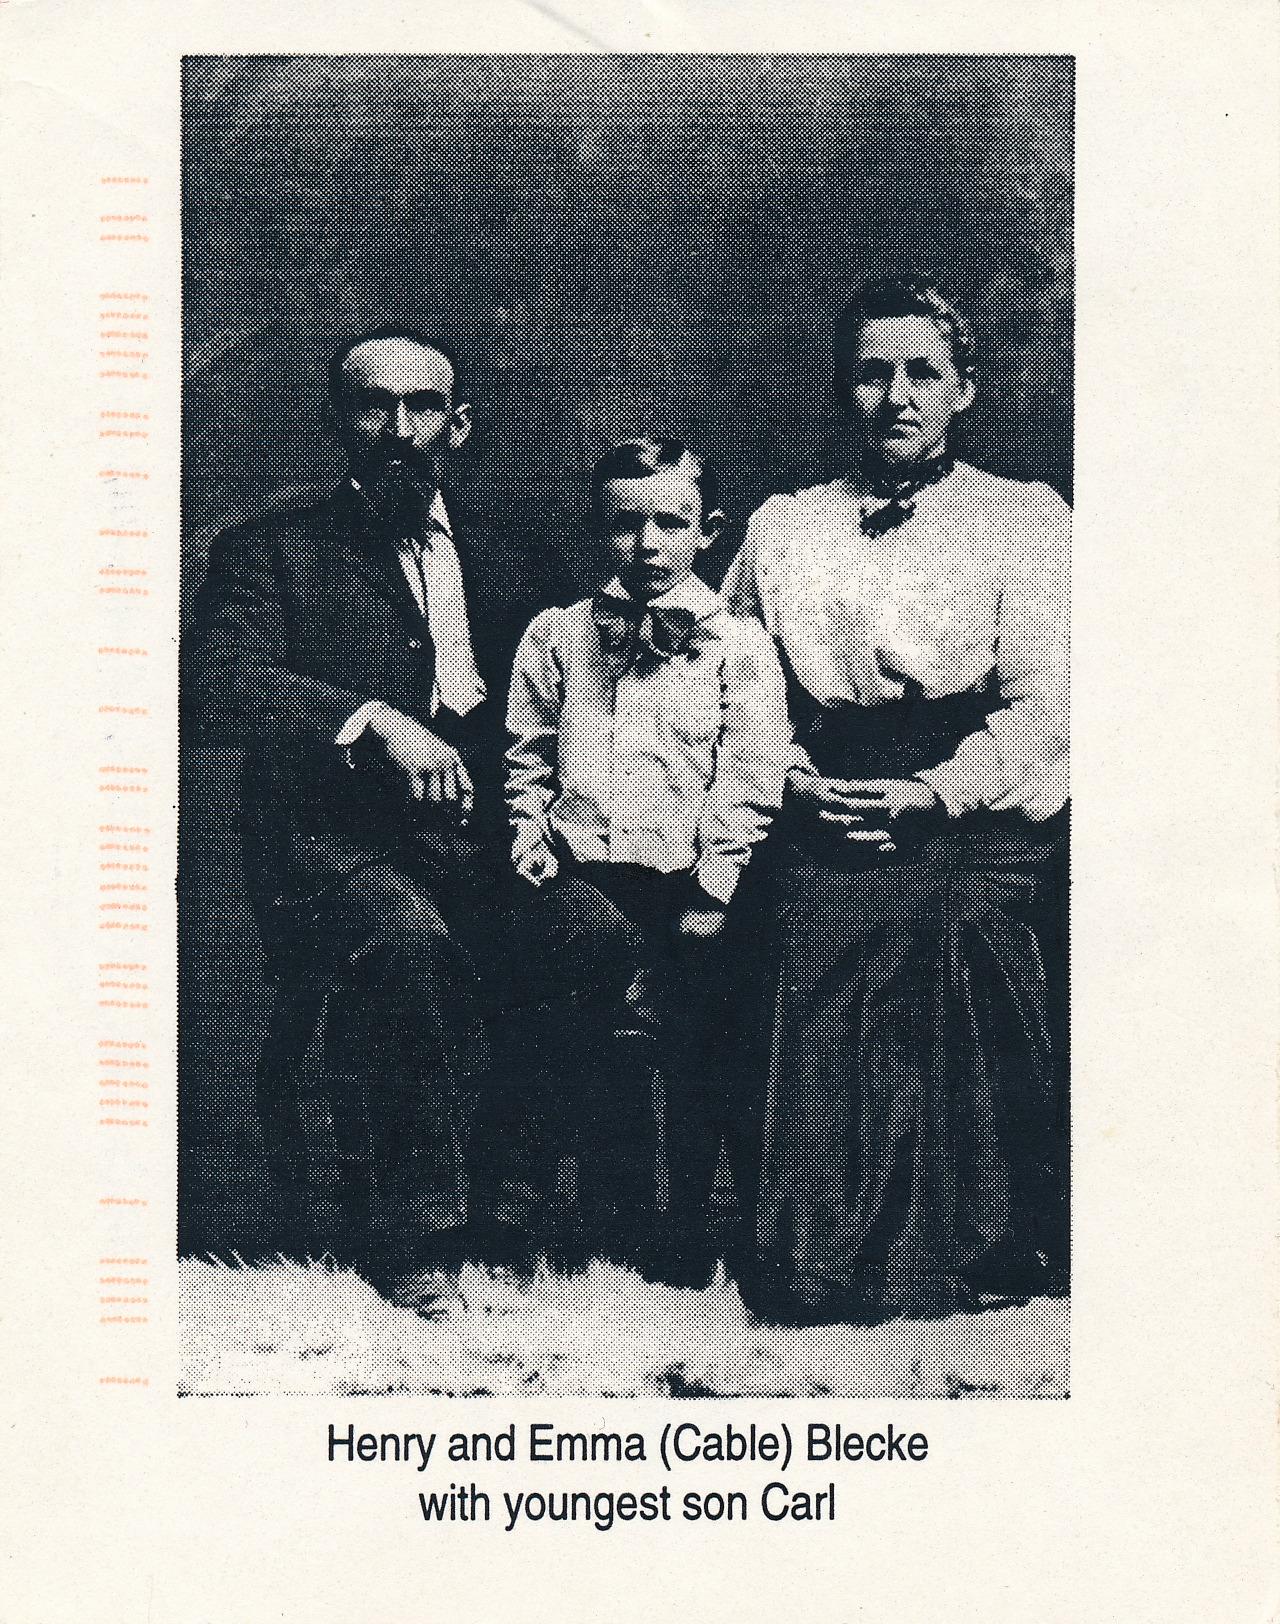 Henry, Emma & little Carl Blecke